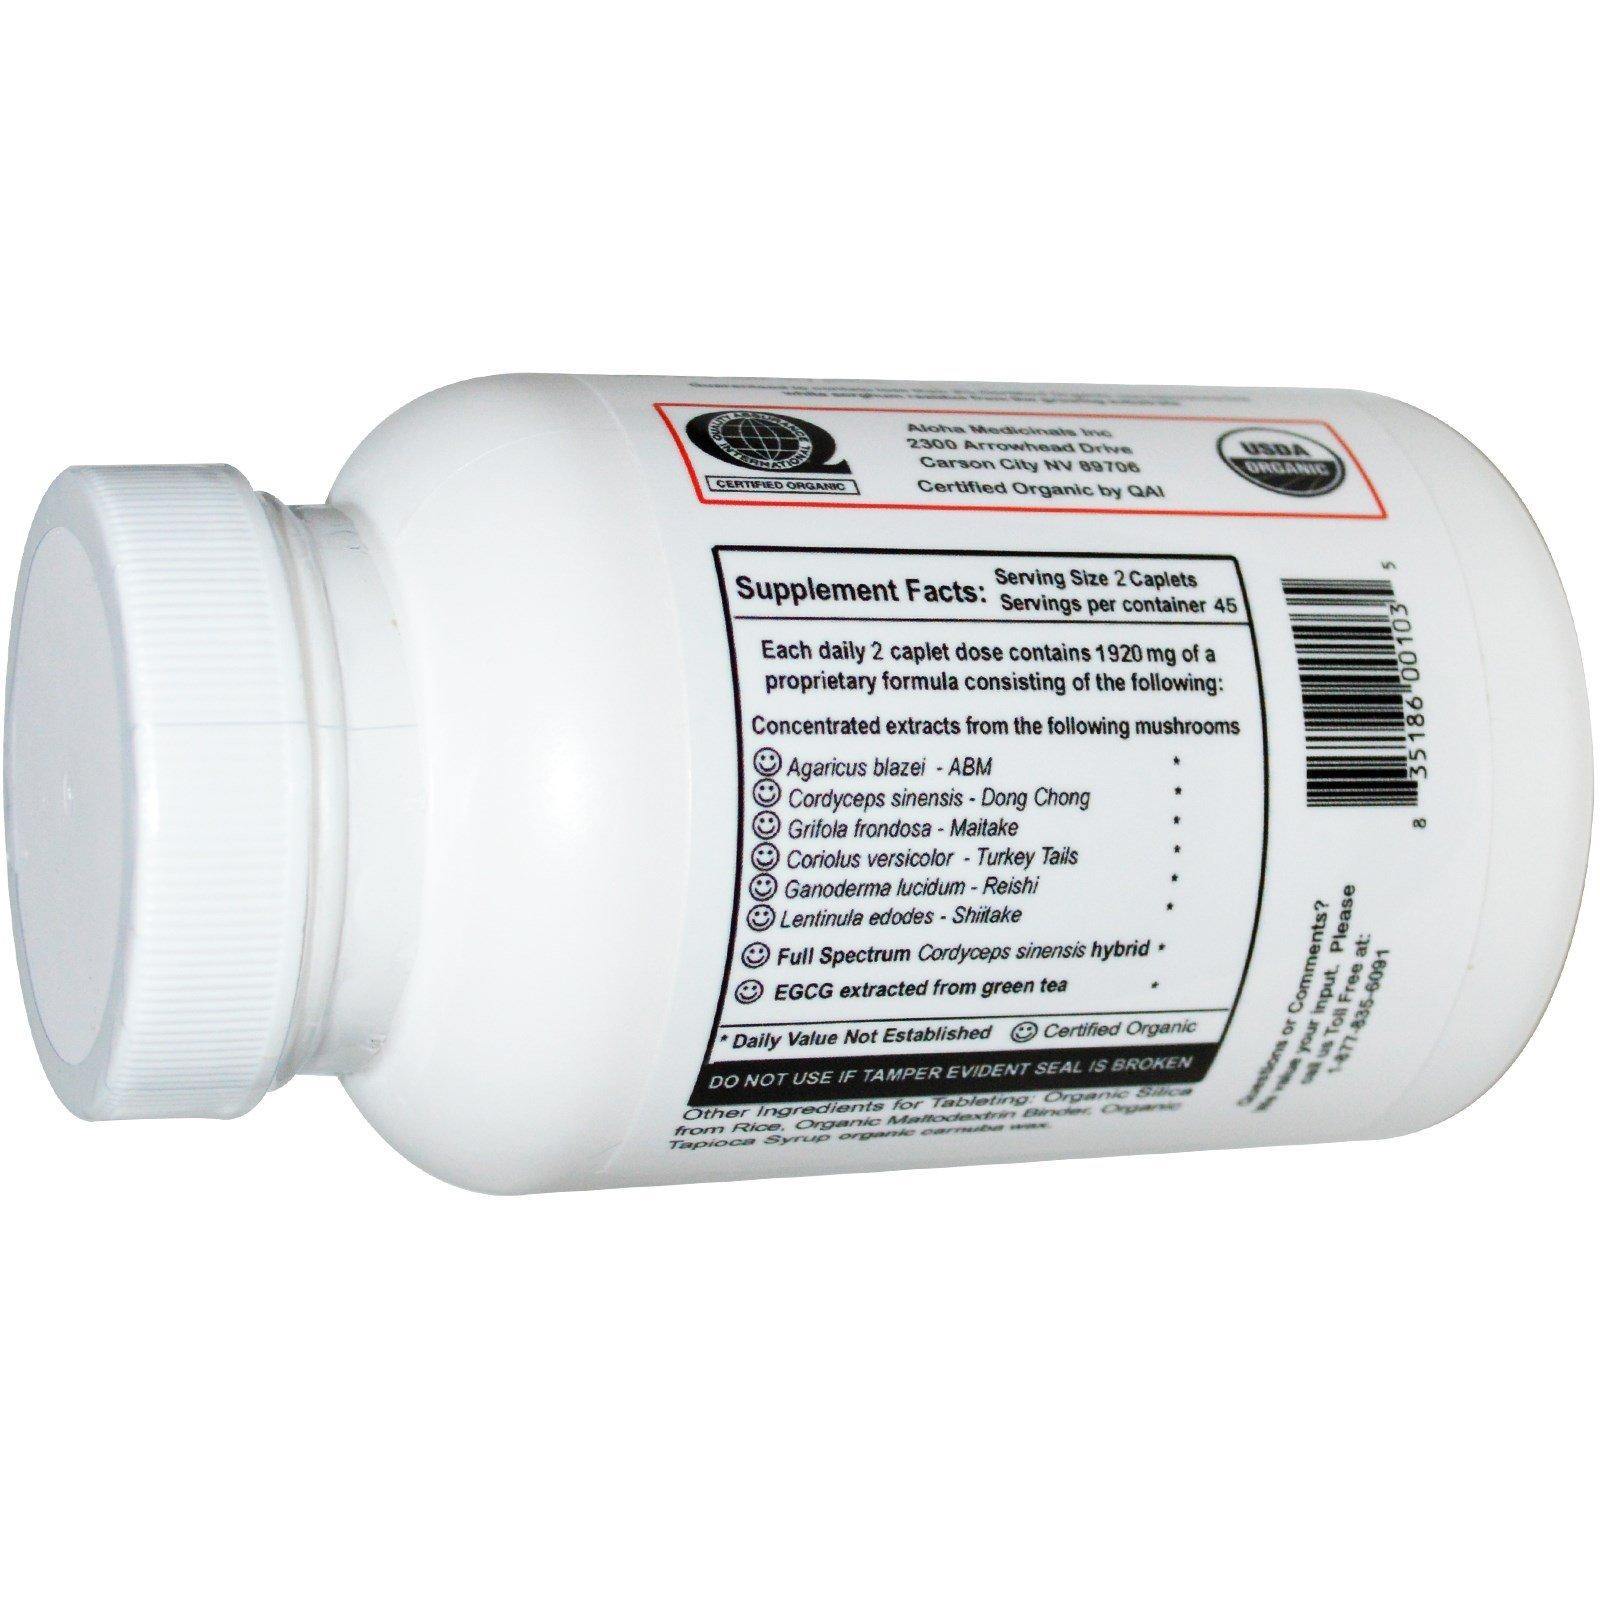 Aloha Medicinals – Immune Assist 24/7 - Organic Mushroom Supplement – Cordyceps, Agaricus blazei. Ganoderma lucidum , Grifola frondosa, Lentinula edodes, Coriolus versicolor